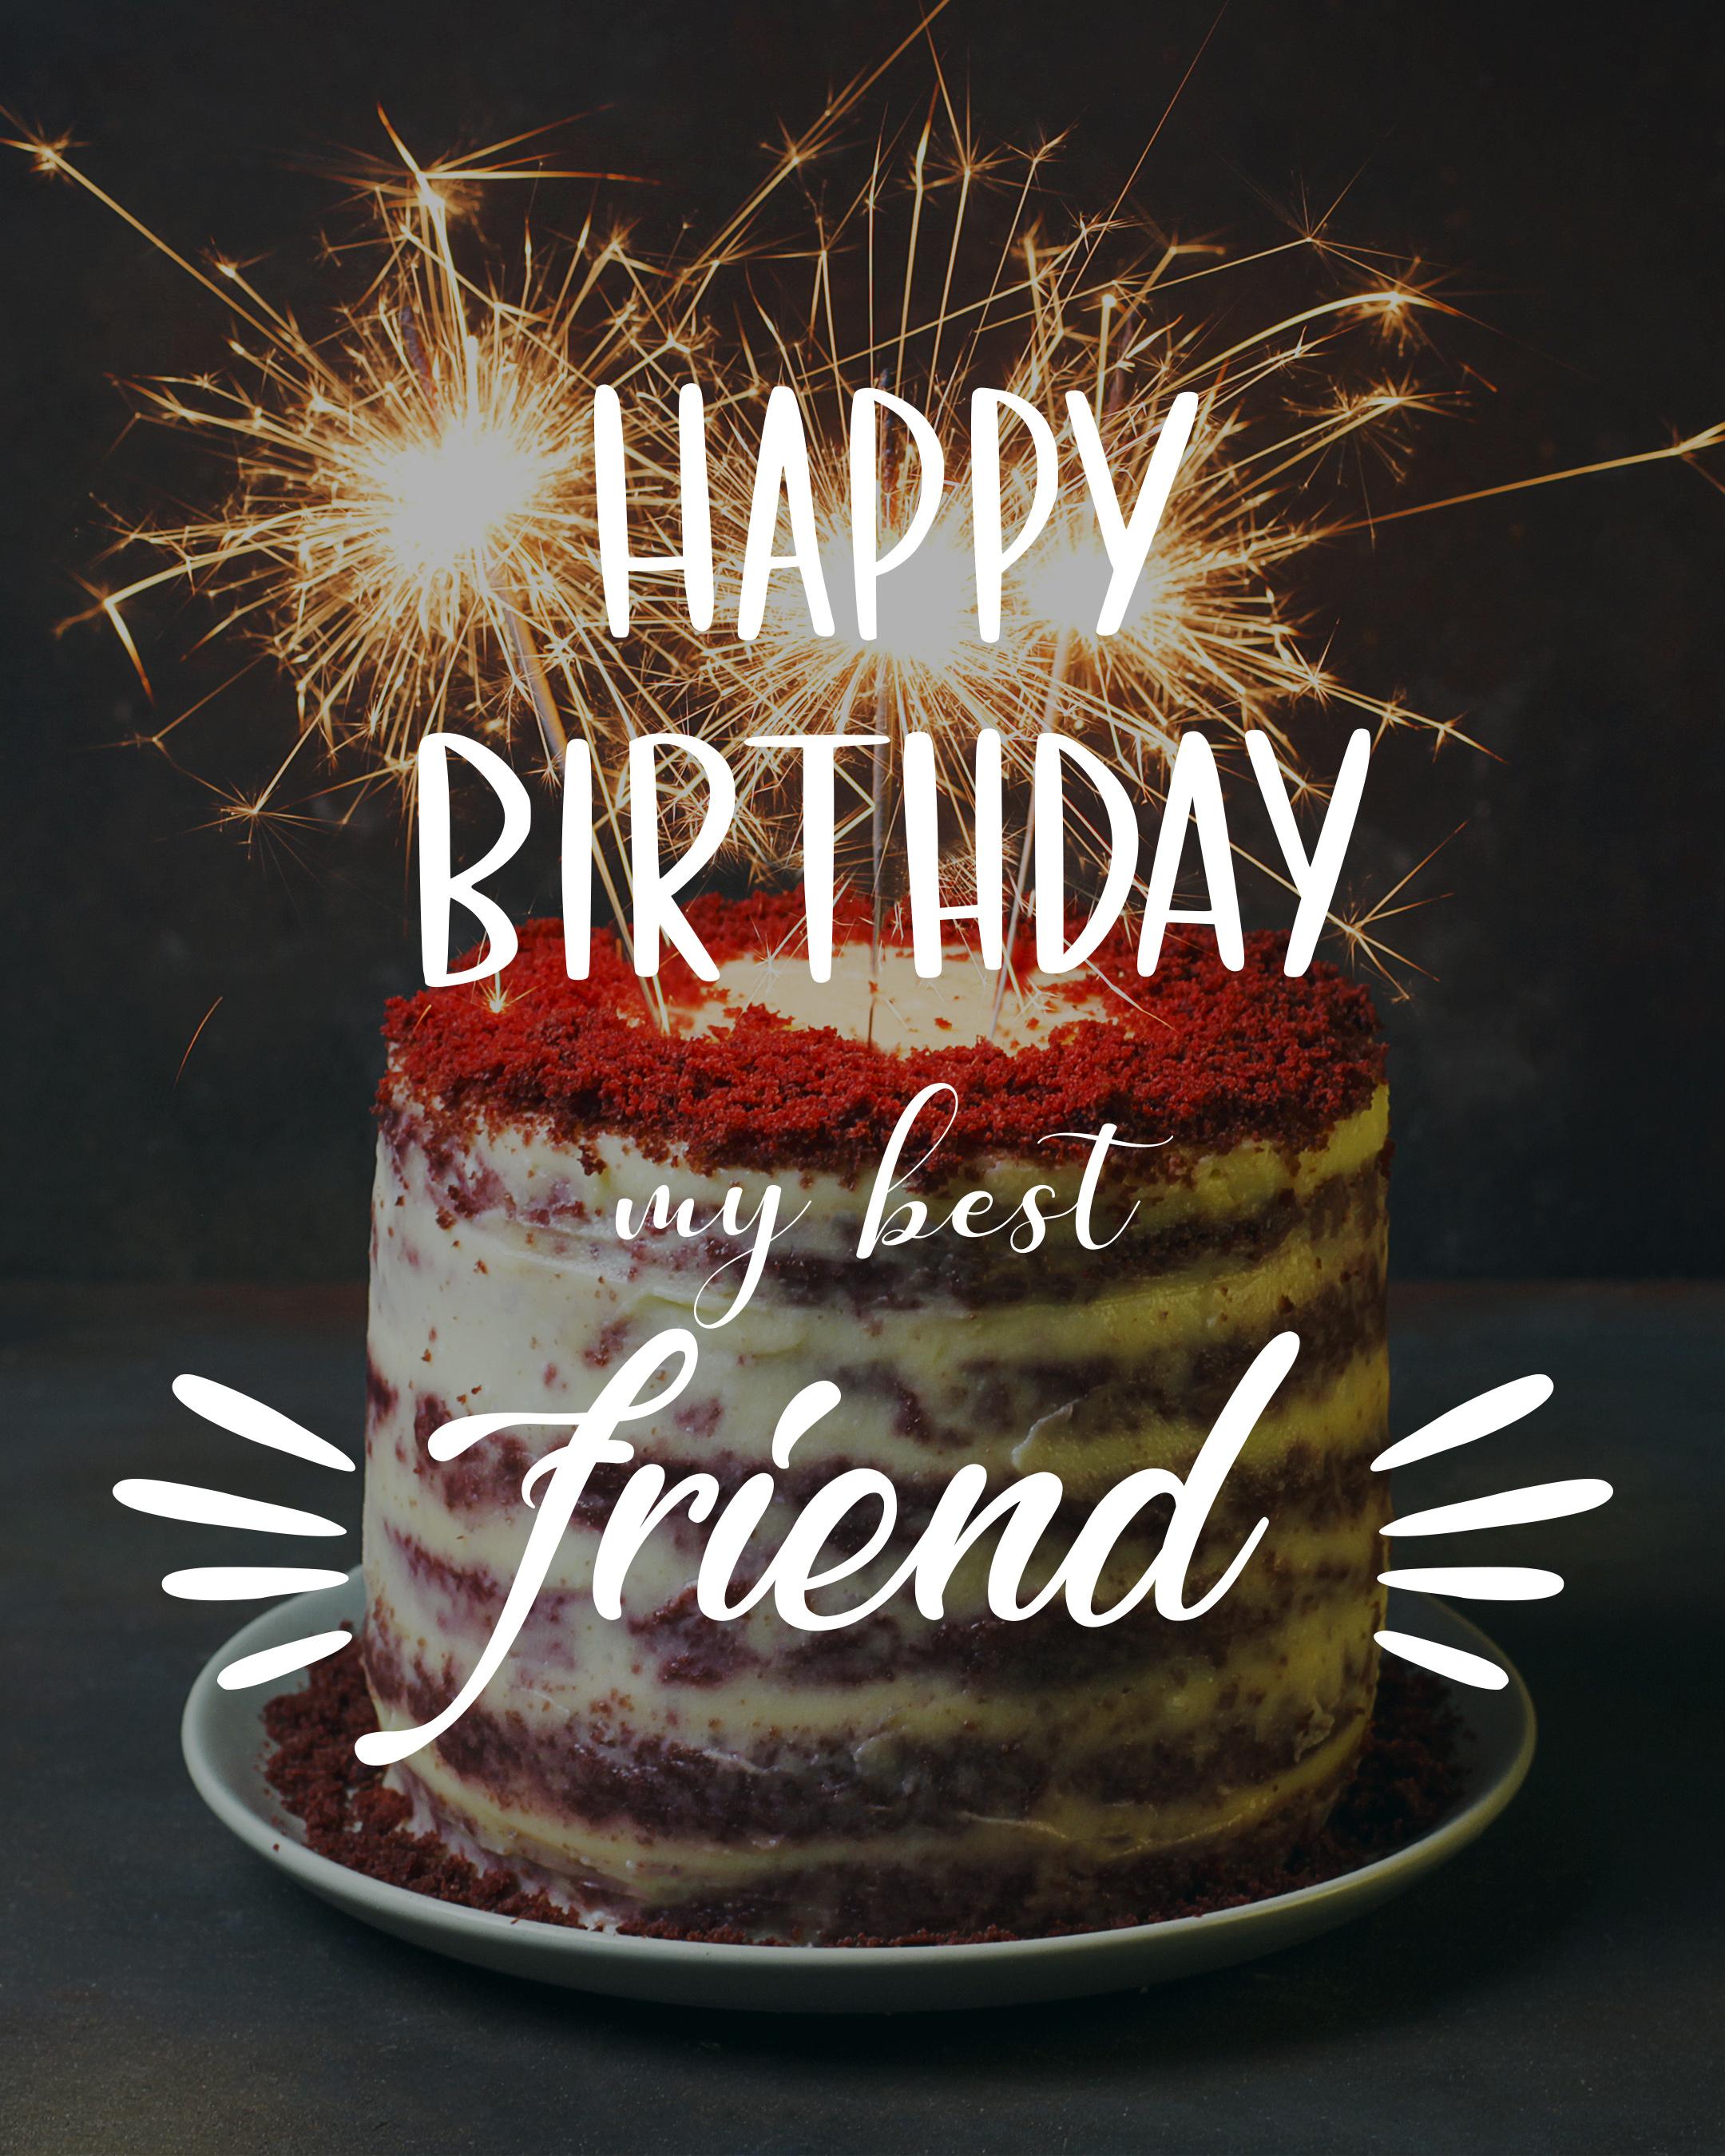 Free Happy Birthday Image for Friend With Cake - birthdayimg.com